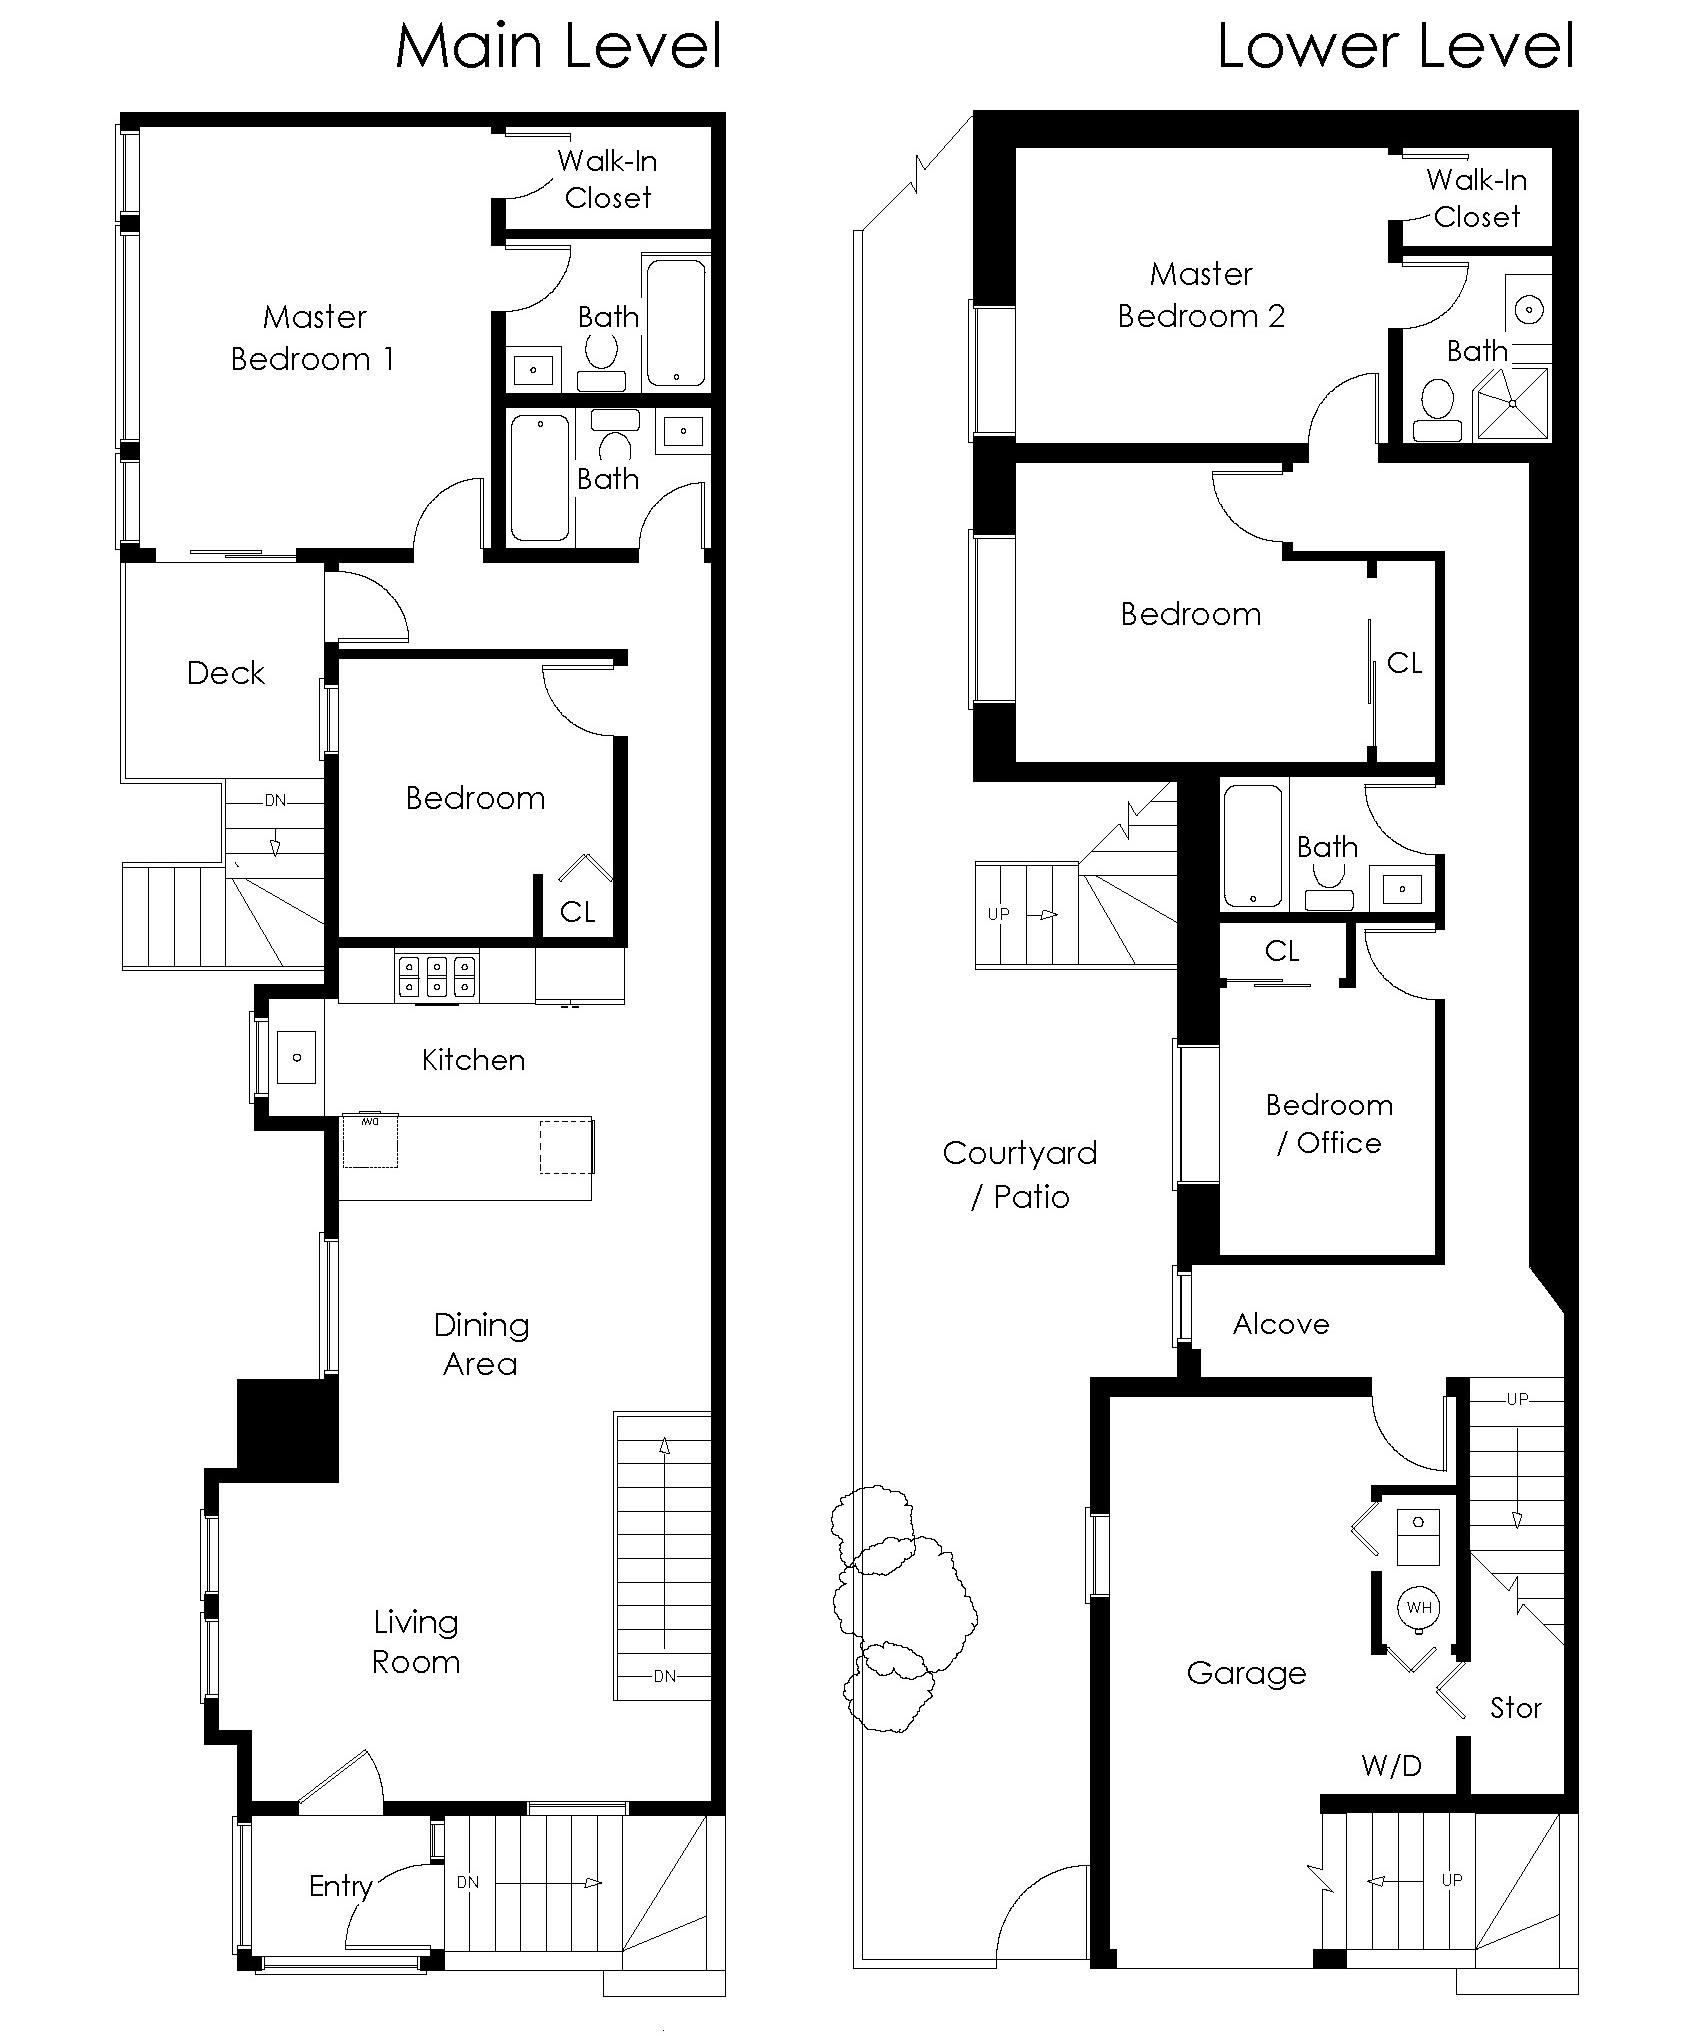 Chief+Architect+8.0++554+Anderson+Street+Compass+D+Zuzic+both+floors.jpg